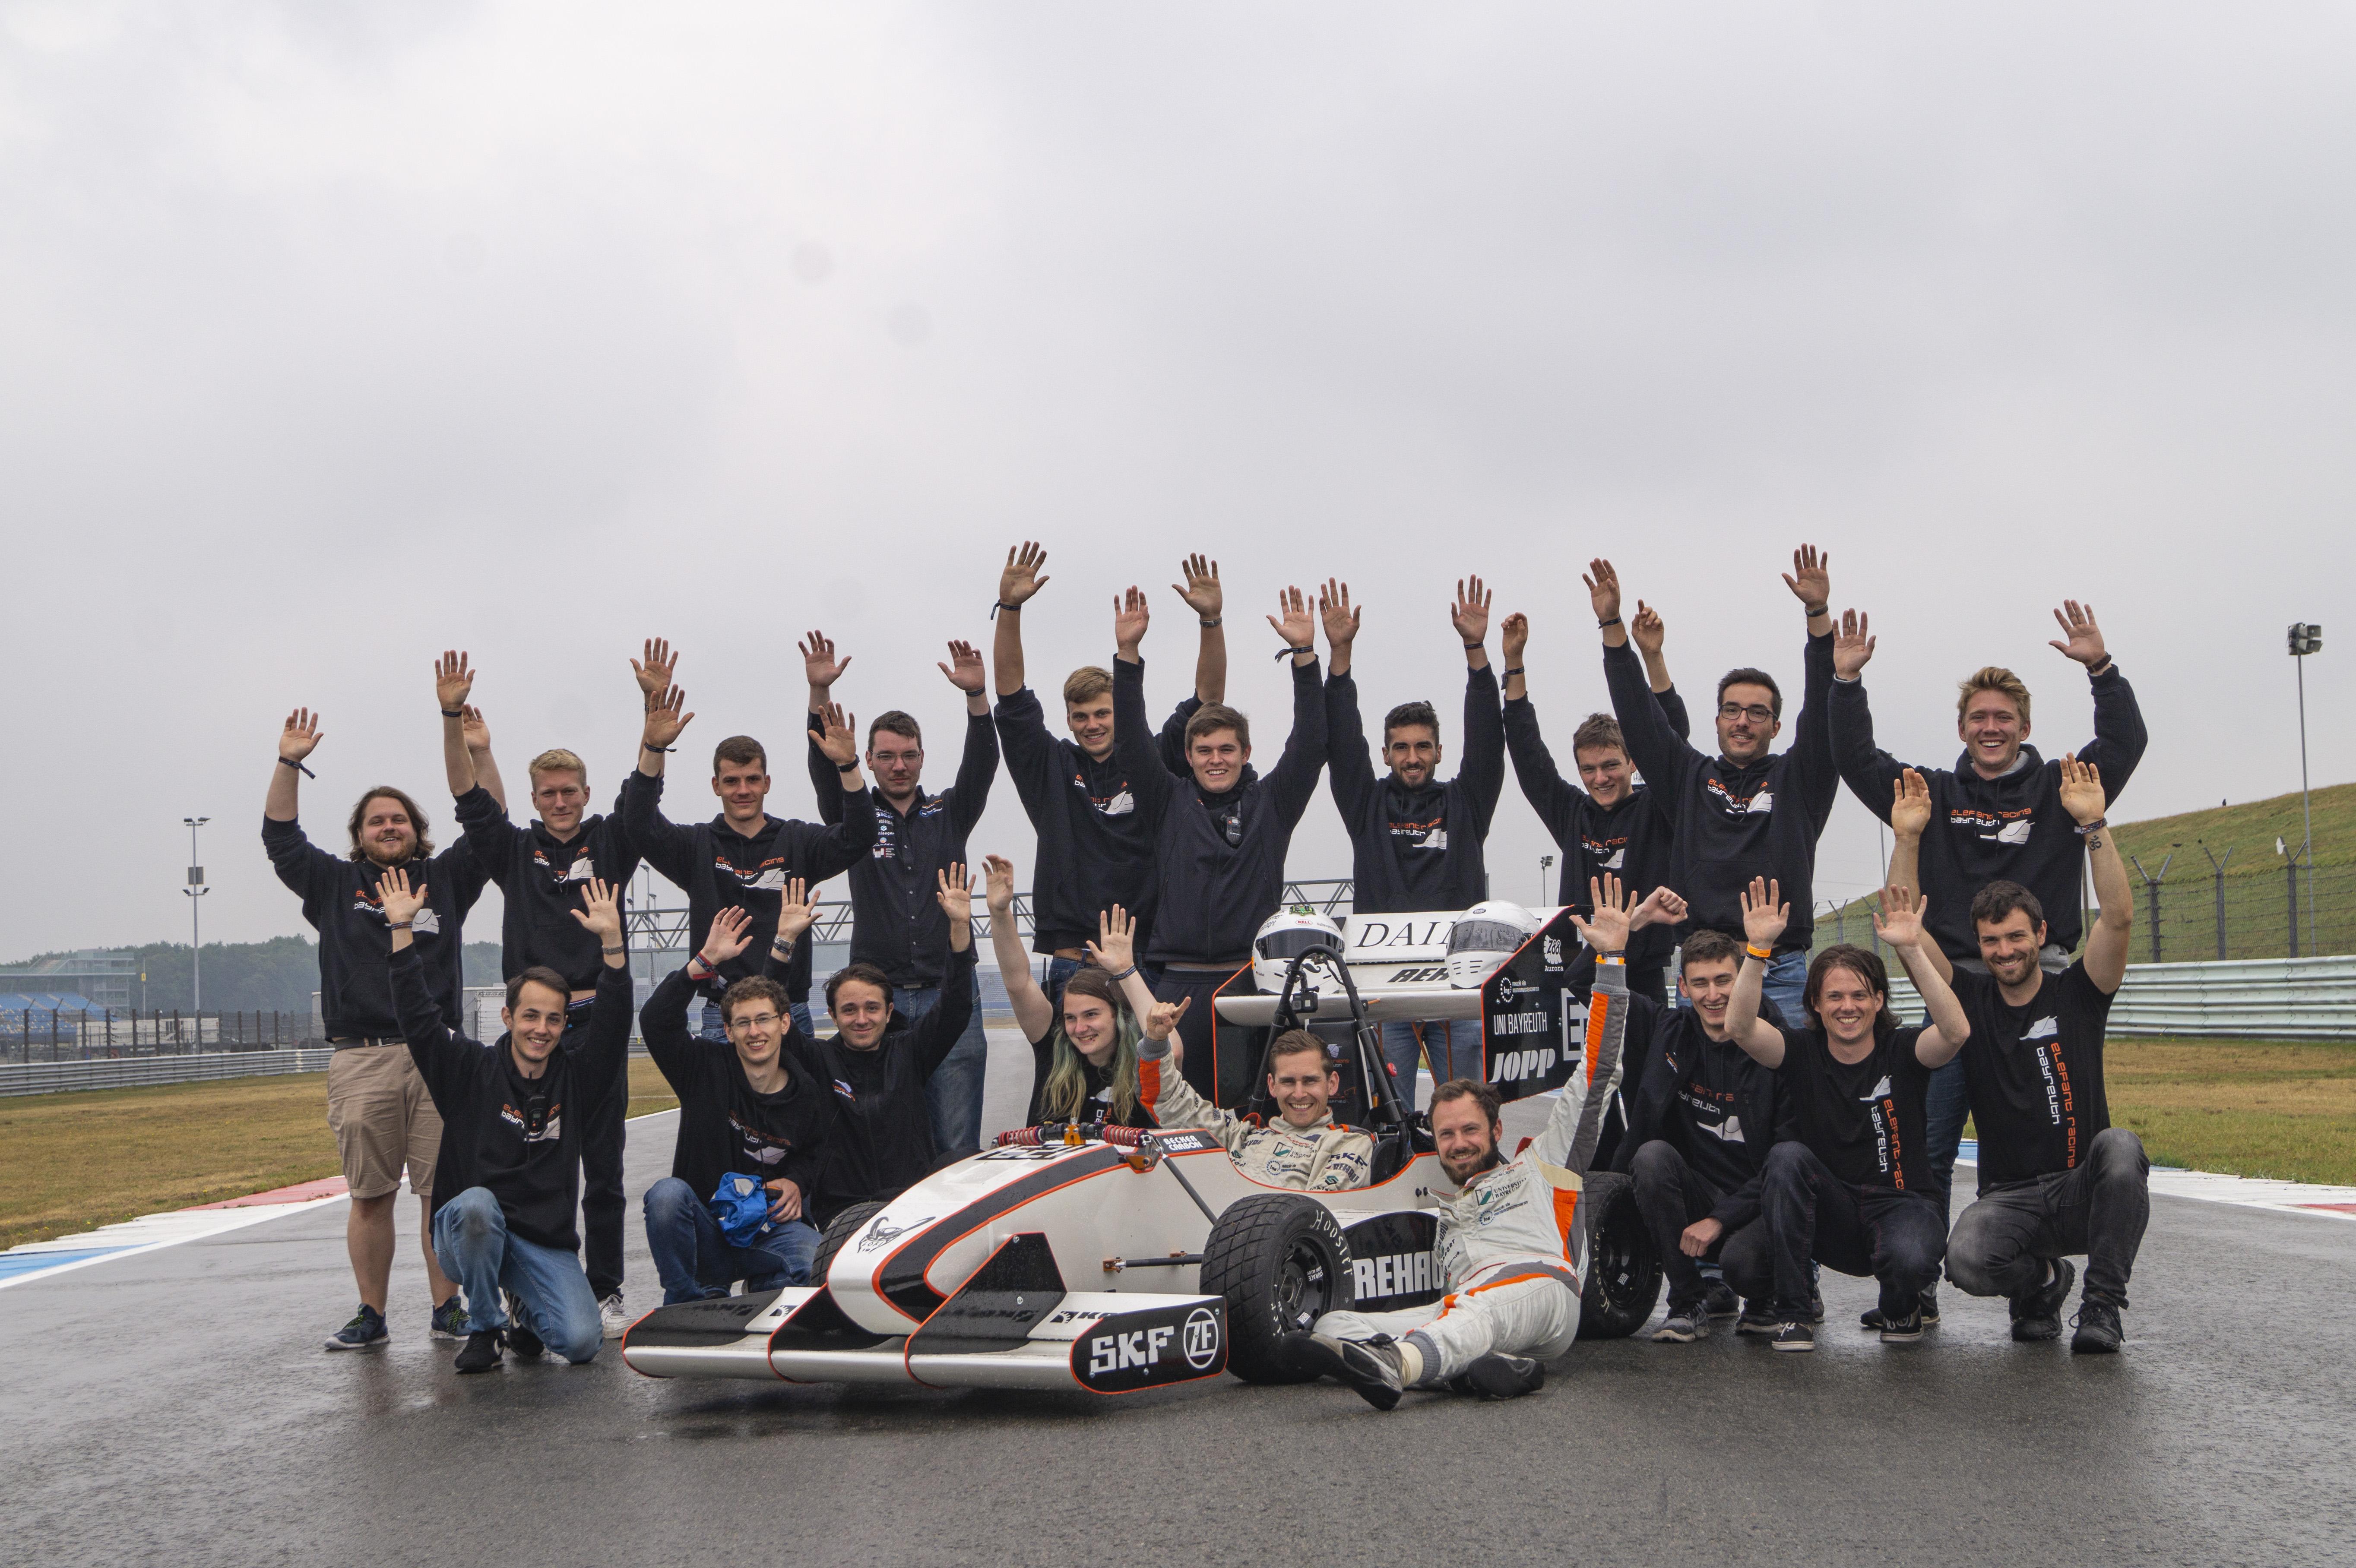 Elefant Racing Team